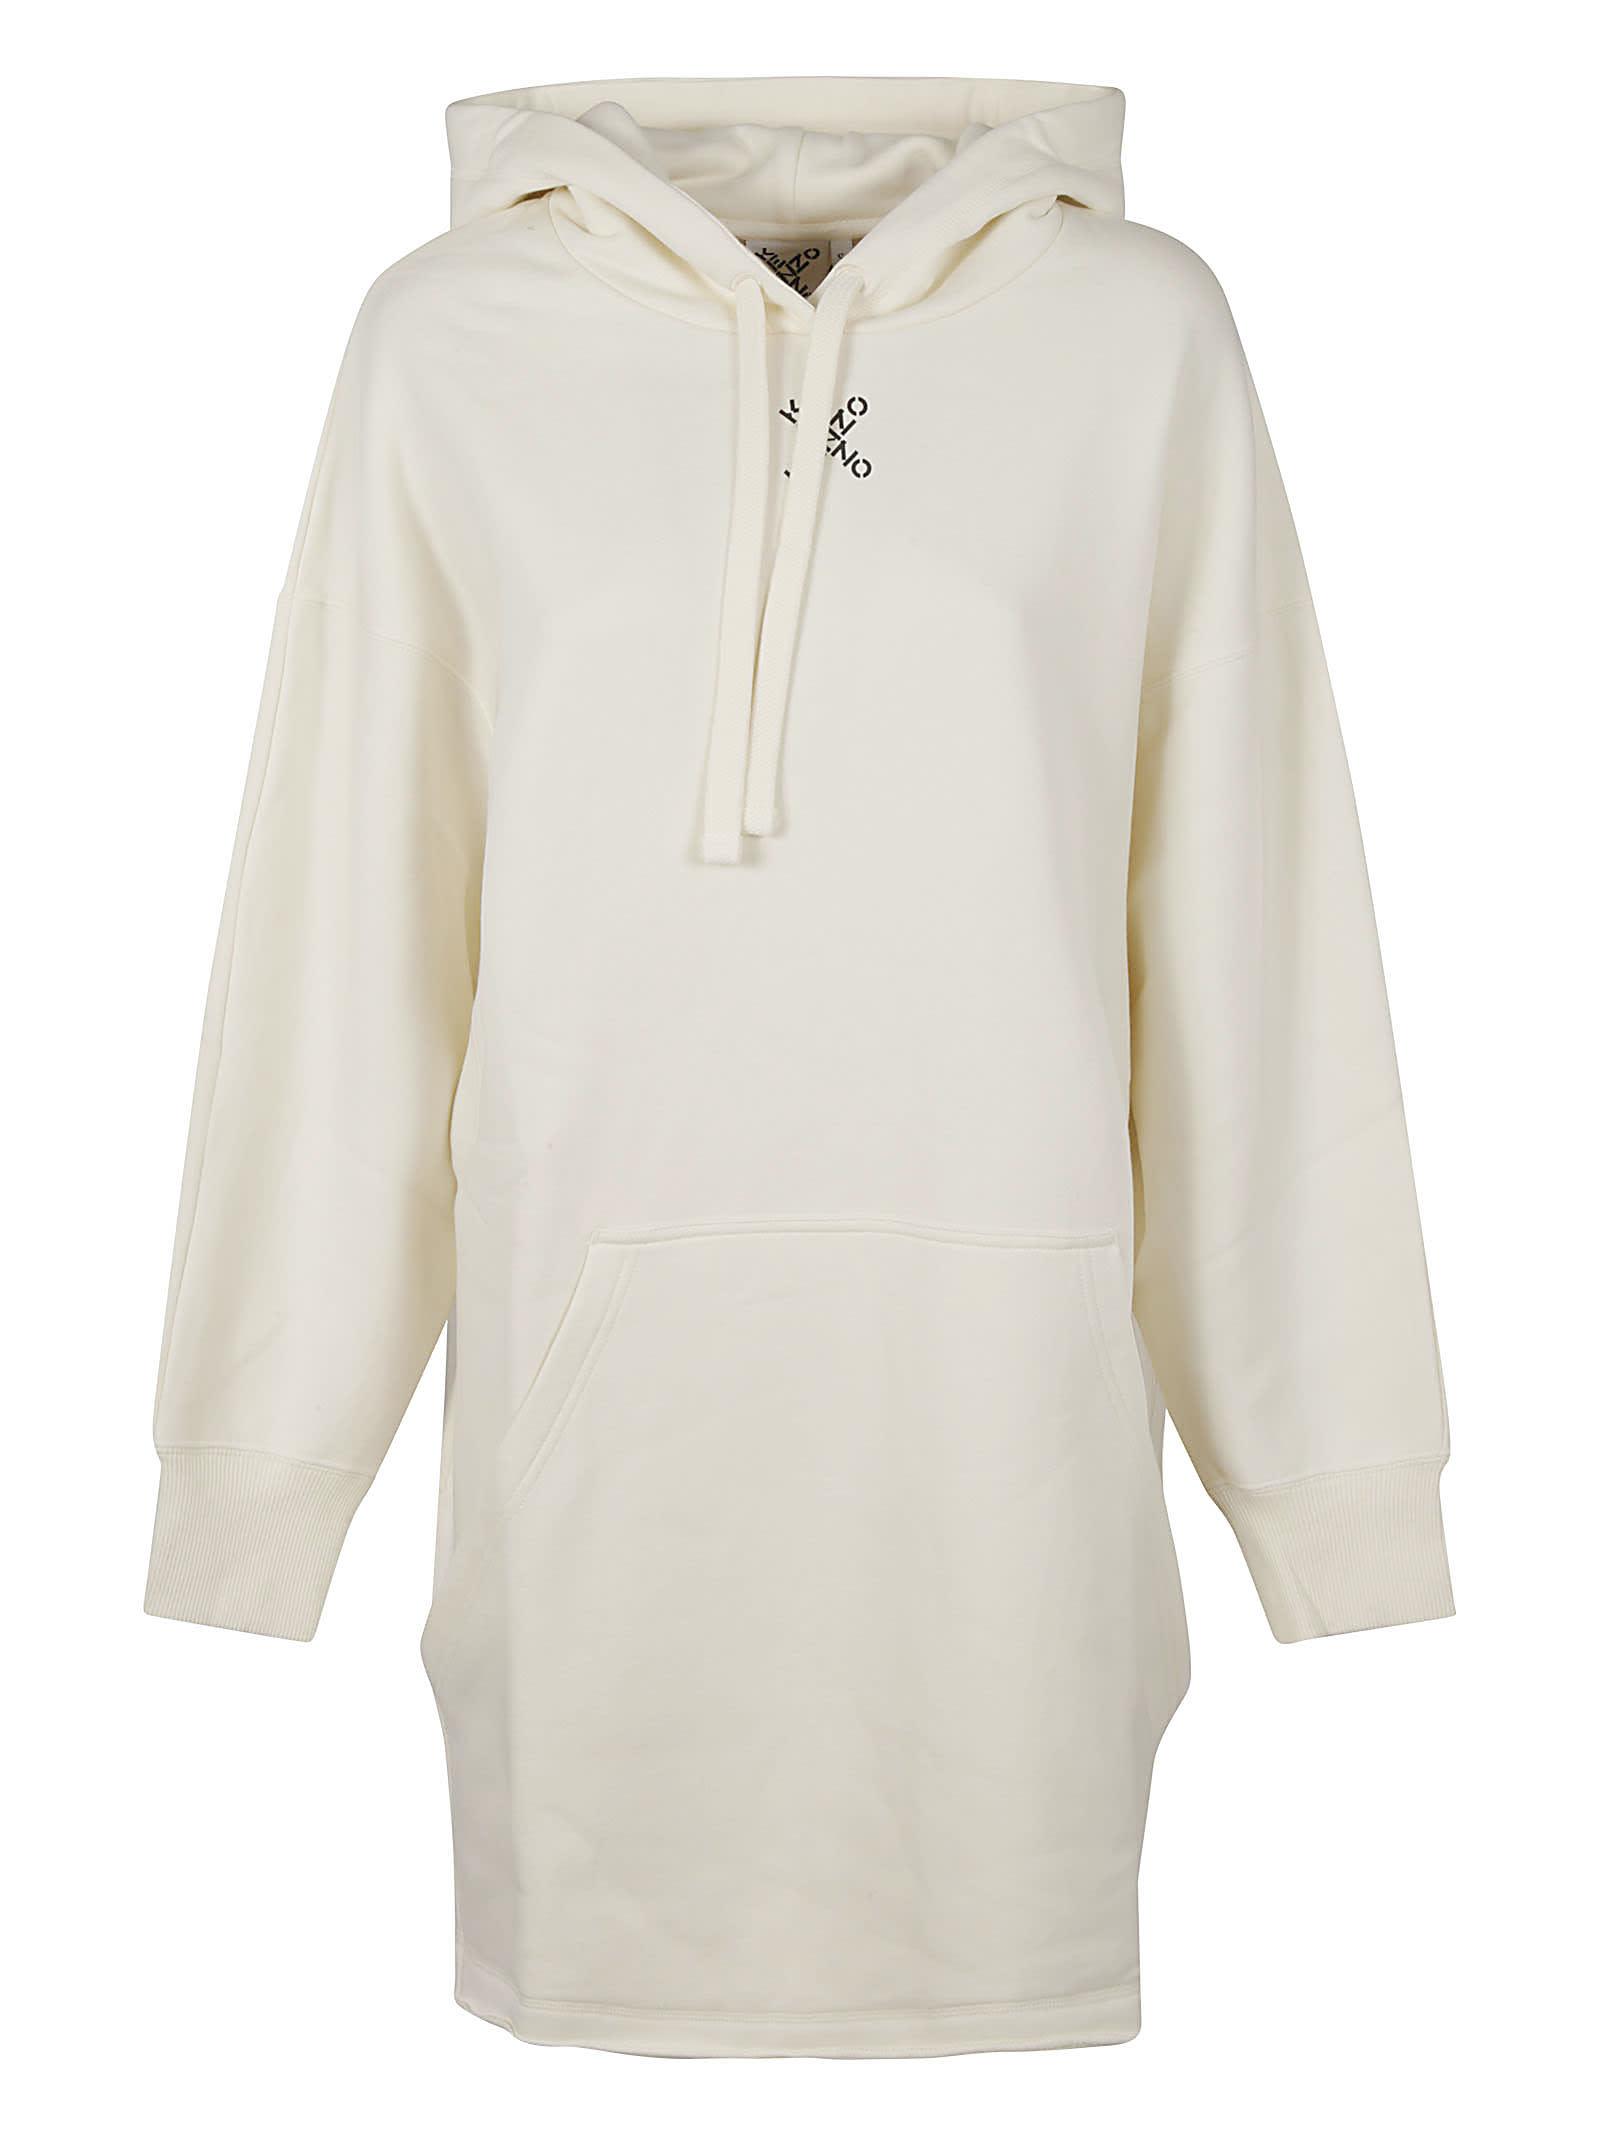 Buy Kenzo Sport Hoodie Dress online, shop Kenzo with free shipping